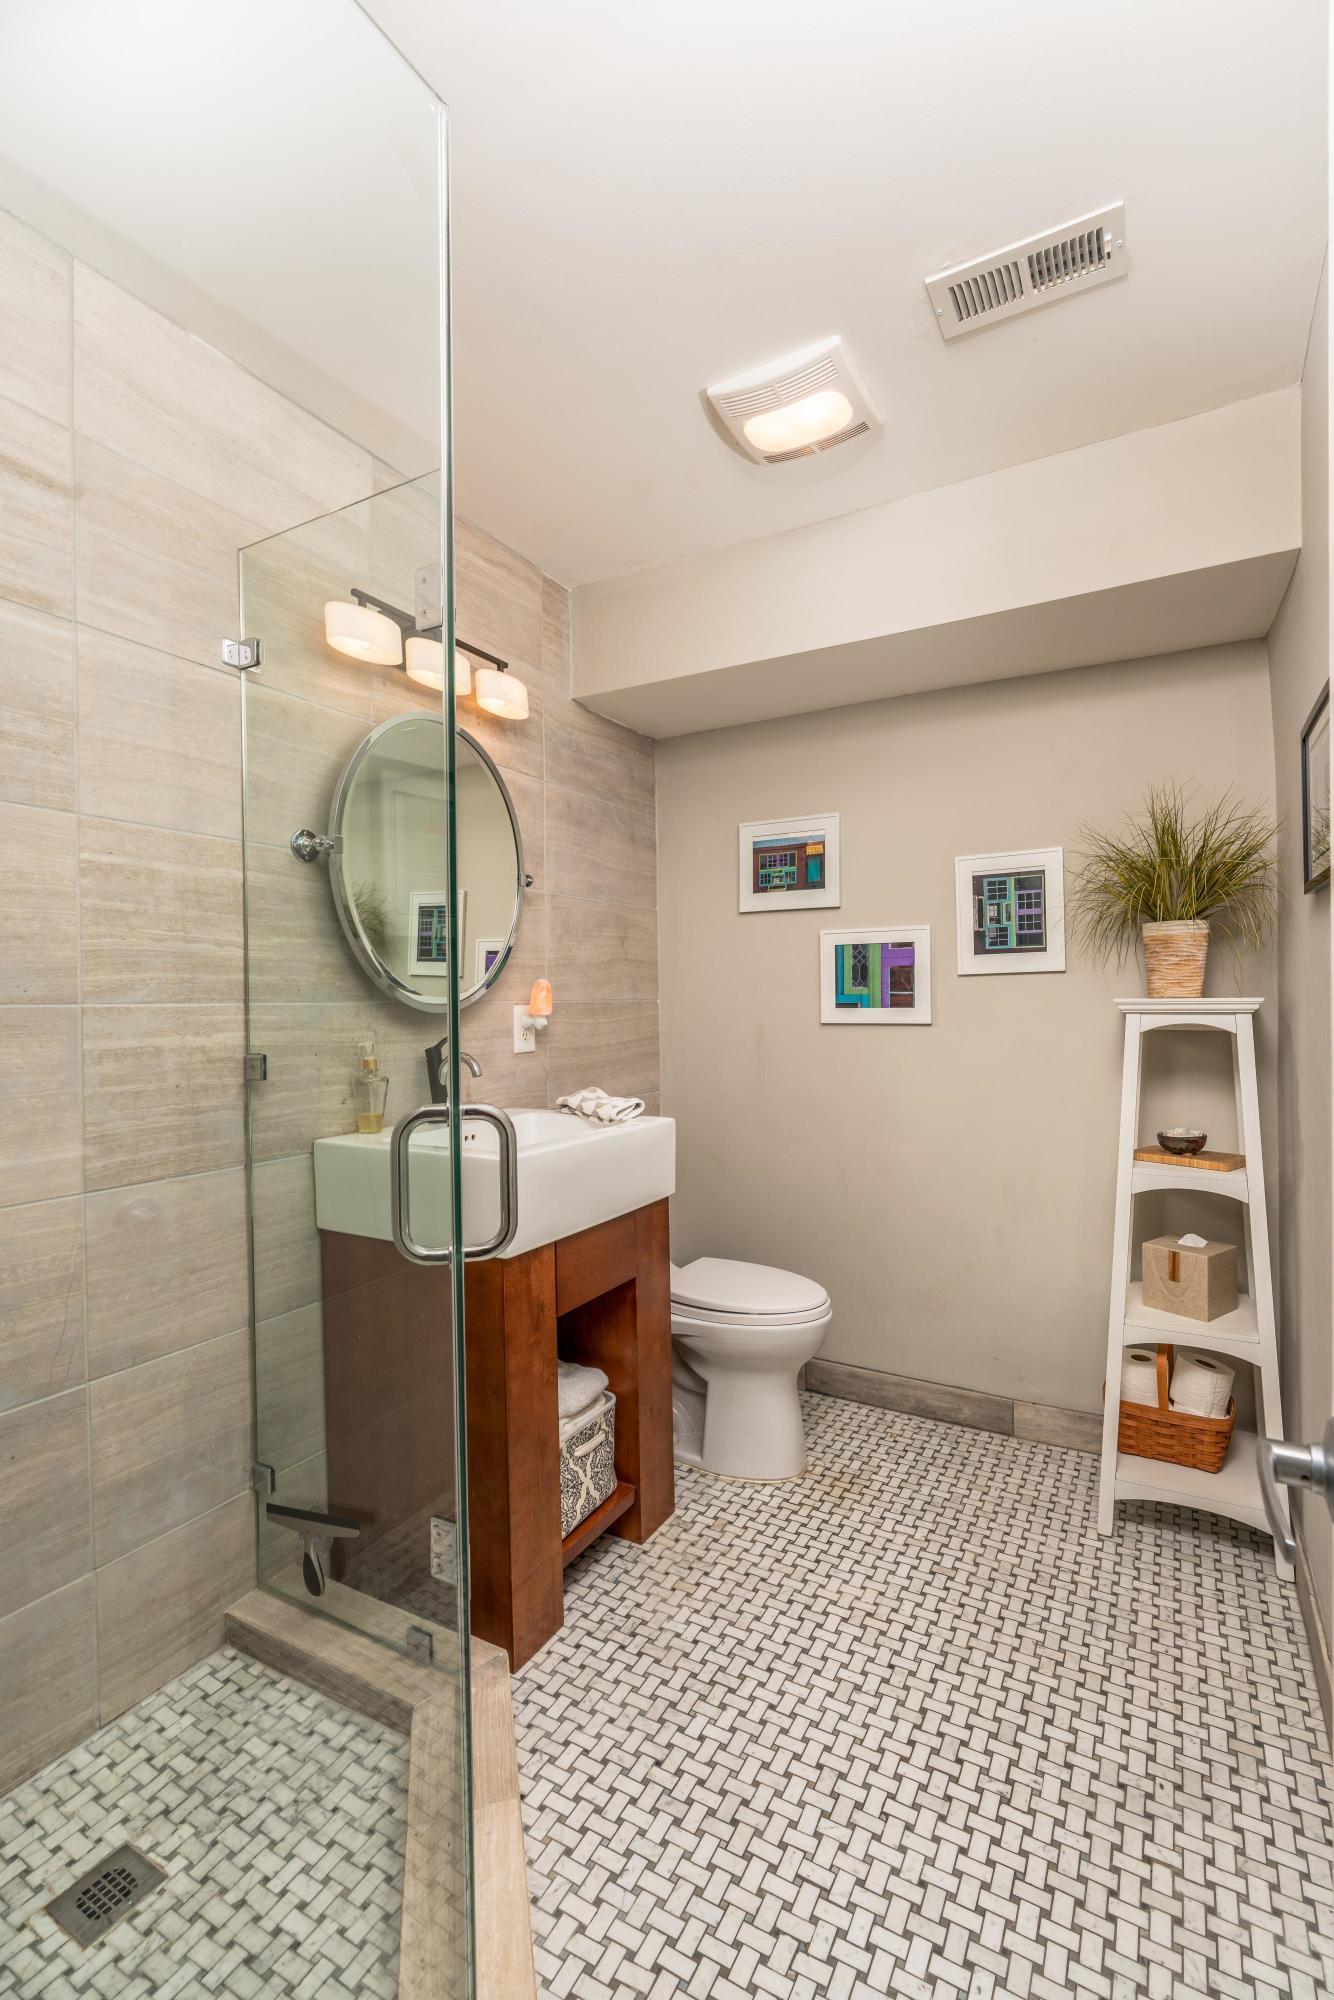 White Point Estates Homes For Sale - 894 White Point, Charleston, SC - 14